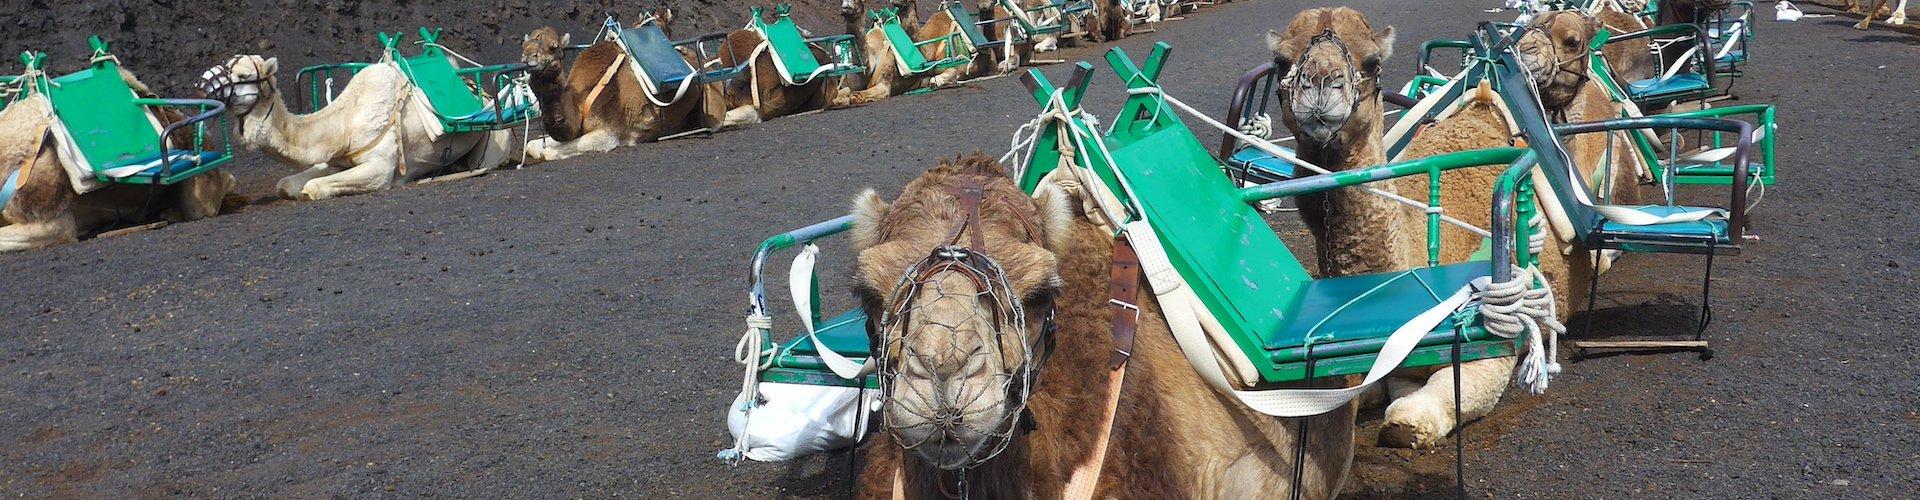 Ausflugsziel Kamelritt Lanzarote